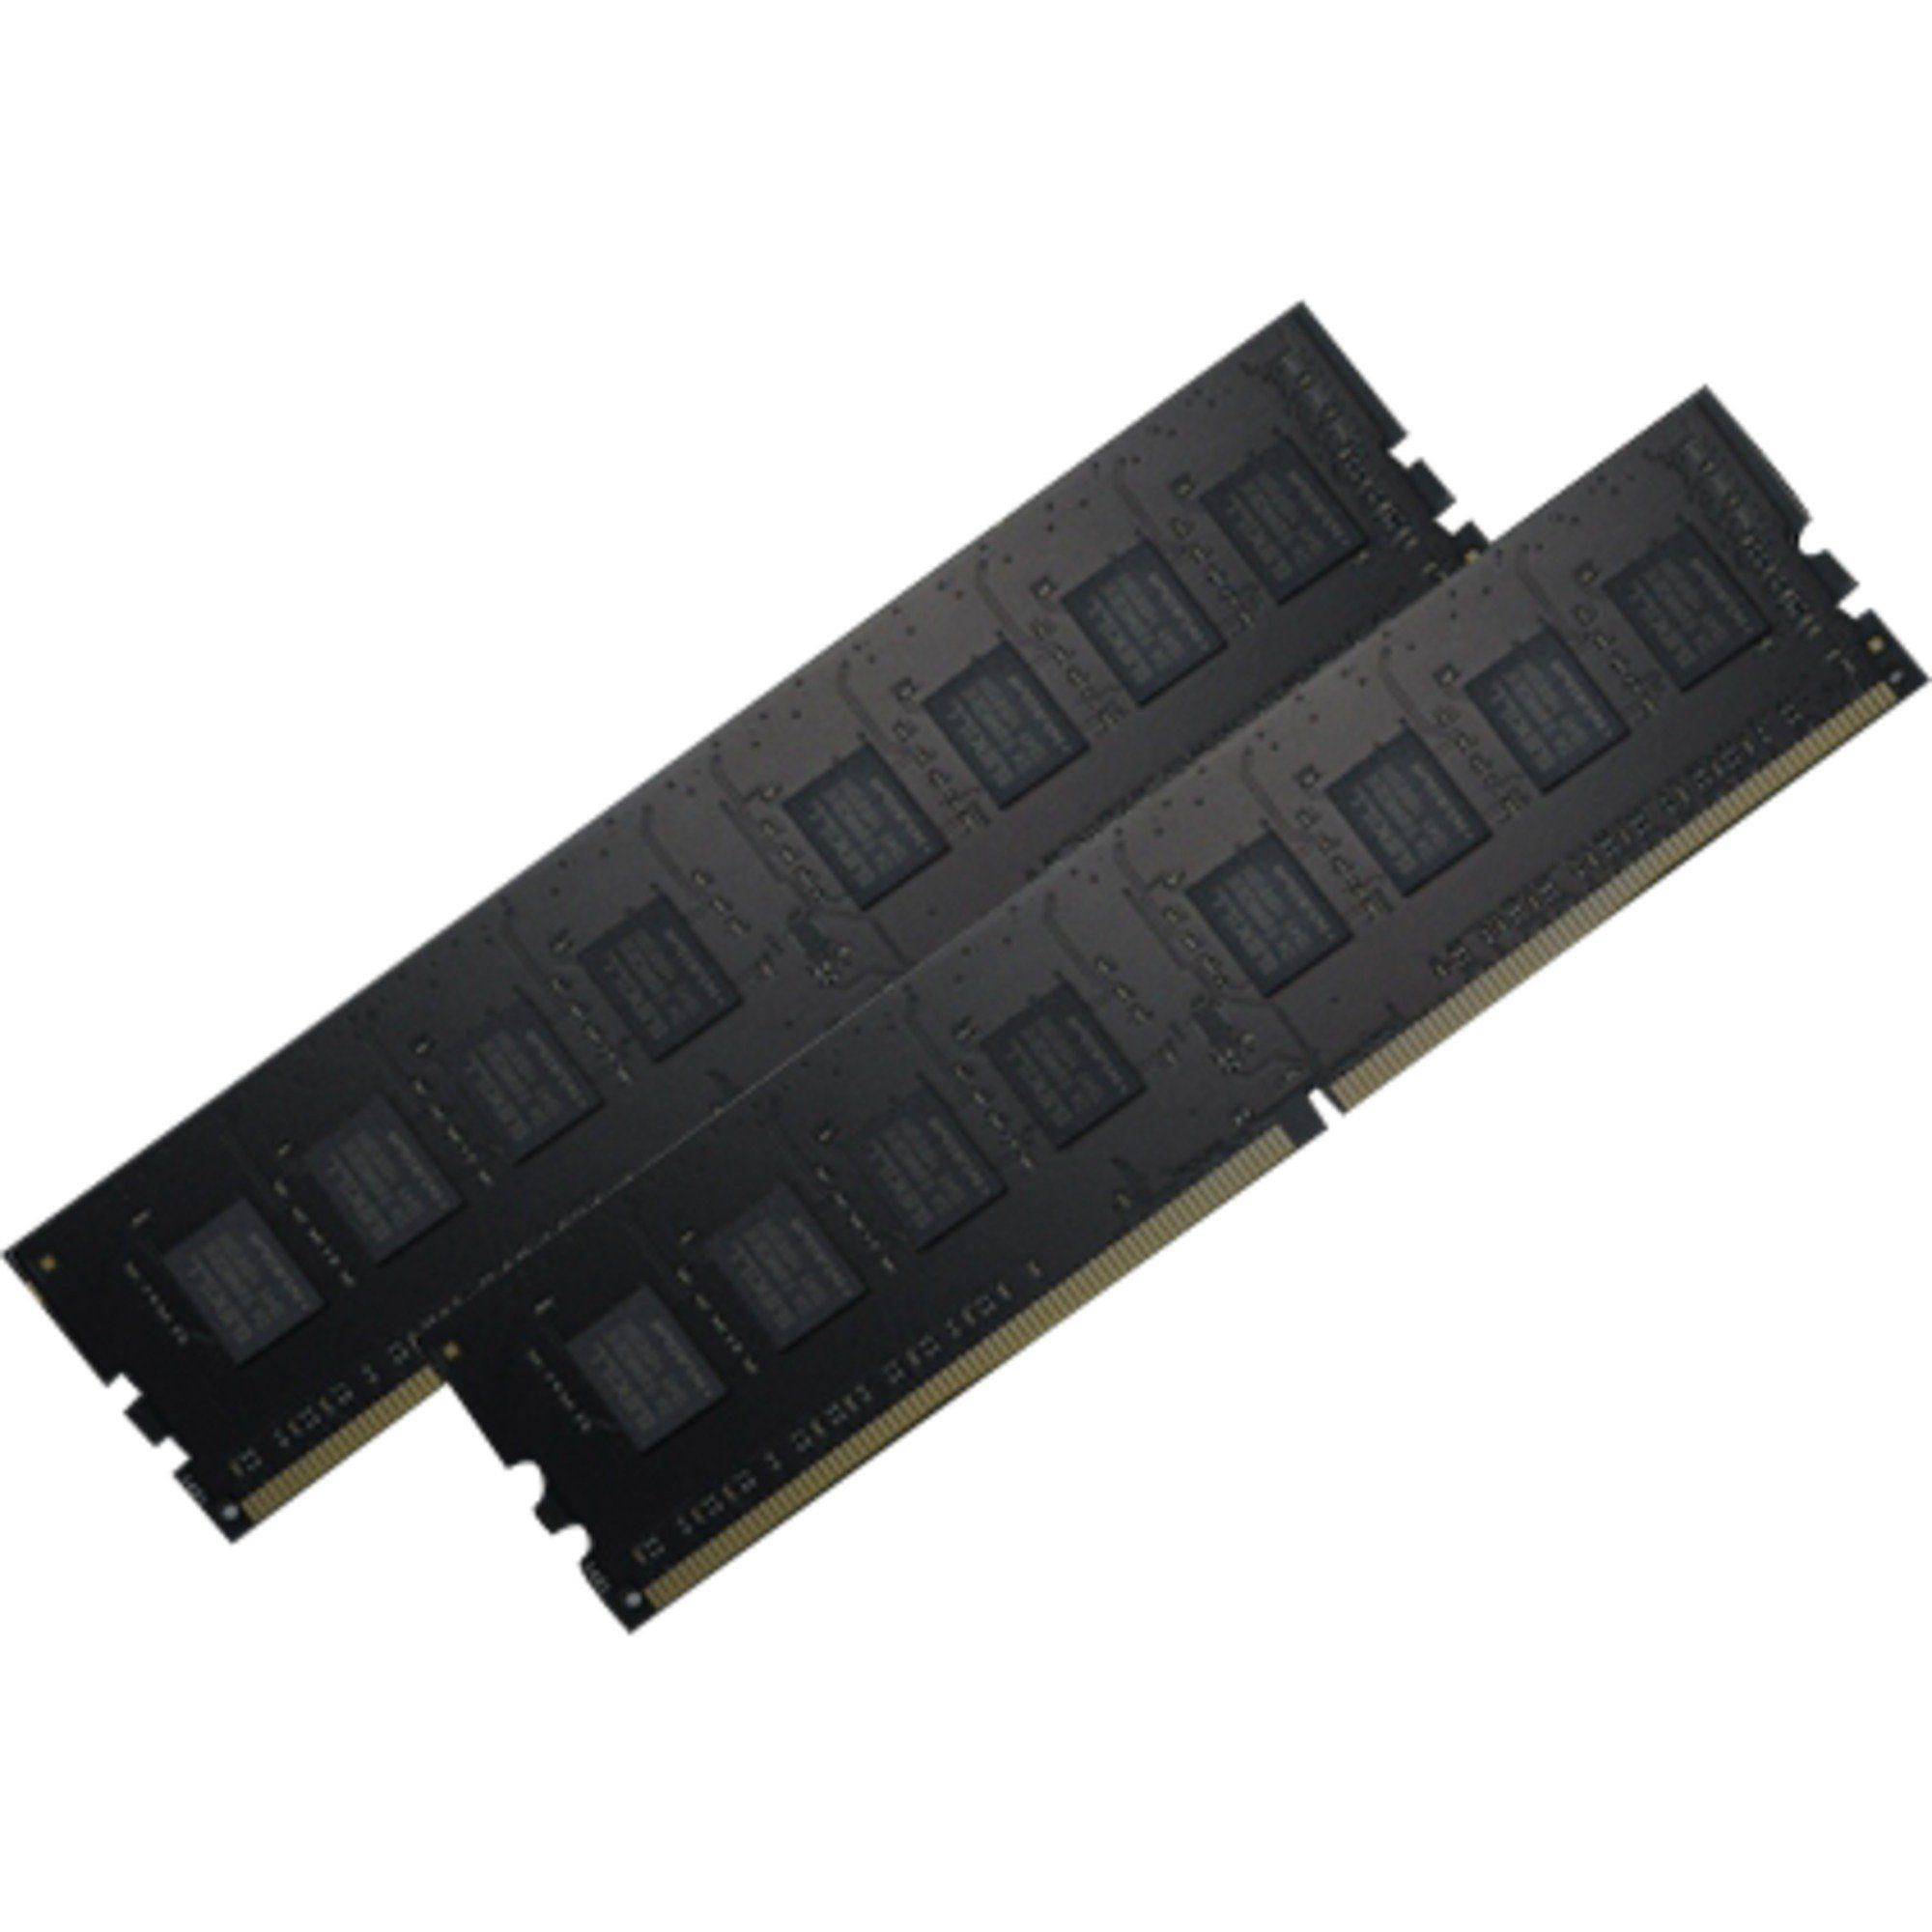 G.Skill Arbeitsspeicher »DIMM 8GB DDR4-2400 Kit, F4-2400C15D-8GNT, Value«